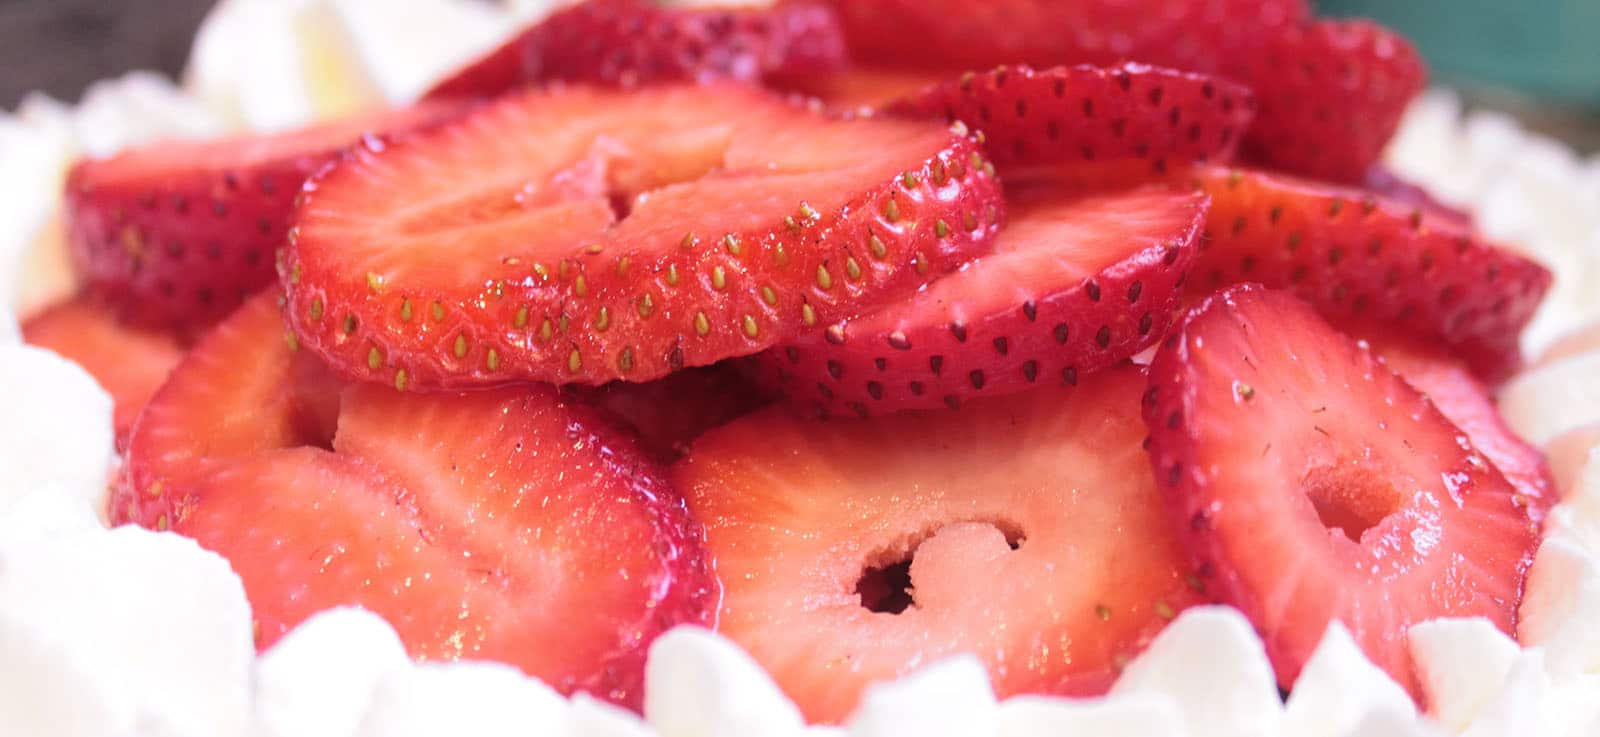 strawberry shortcake - made to order gluten free